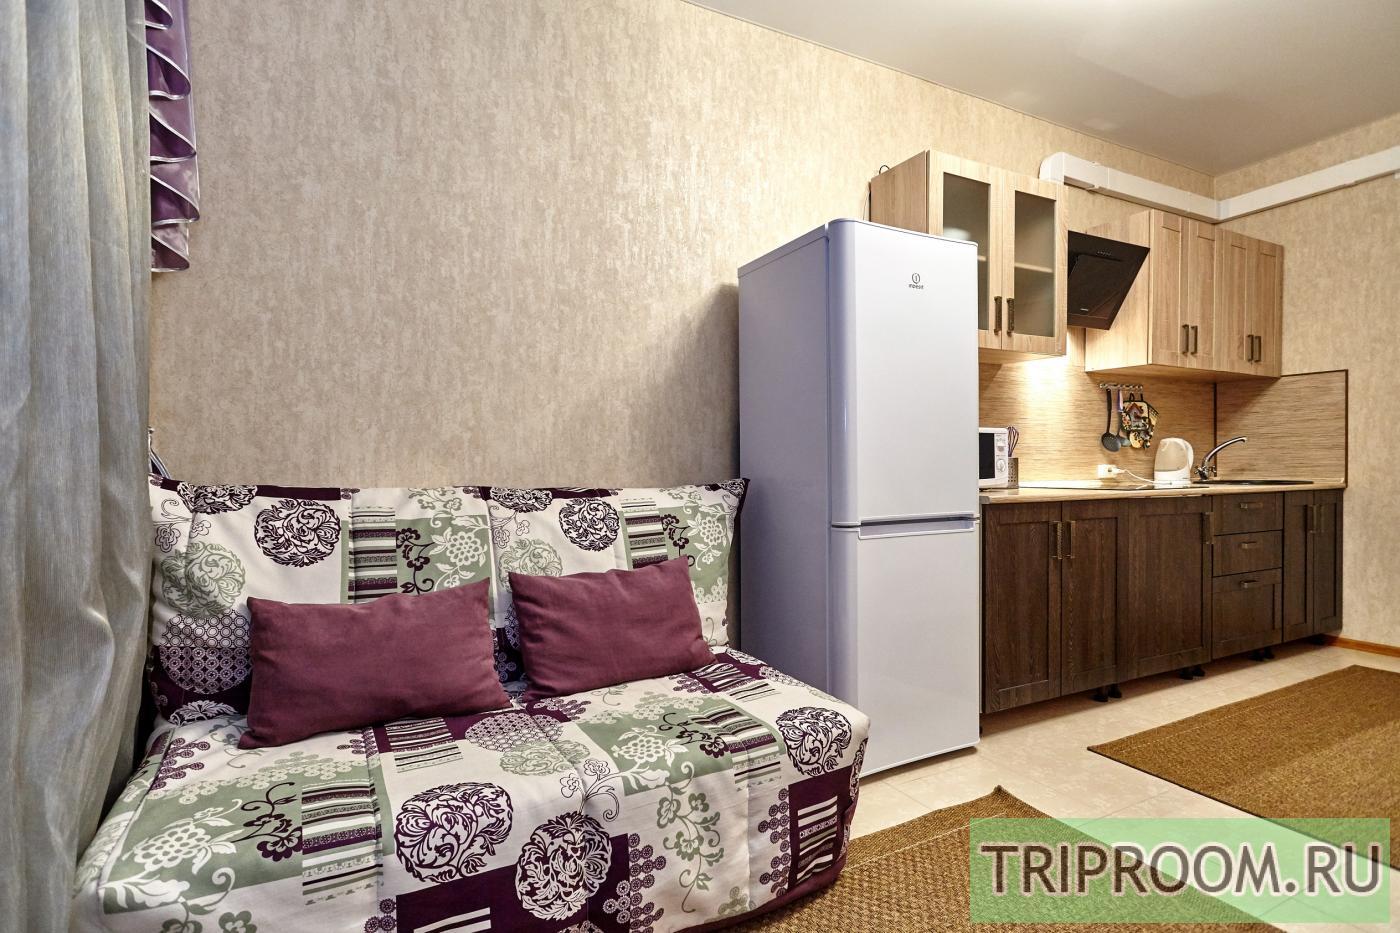 1-комнатная квартира посуточно (вариант № 6860), ул. Соколова улица, фото № 9